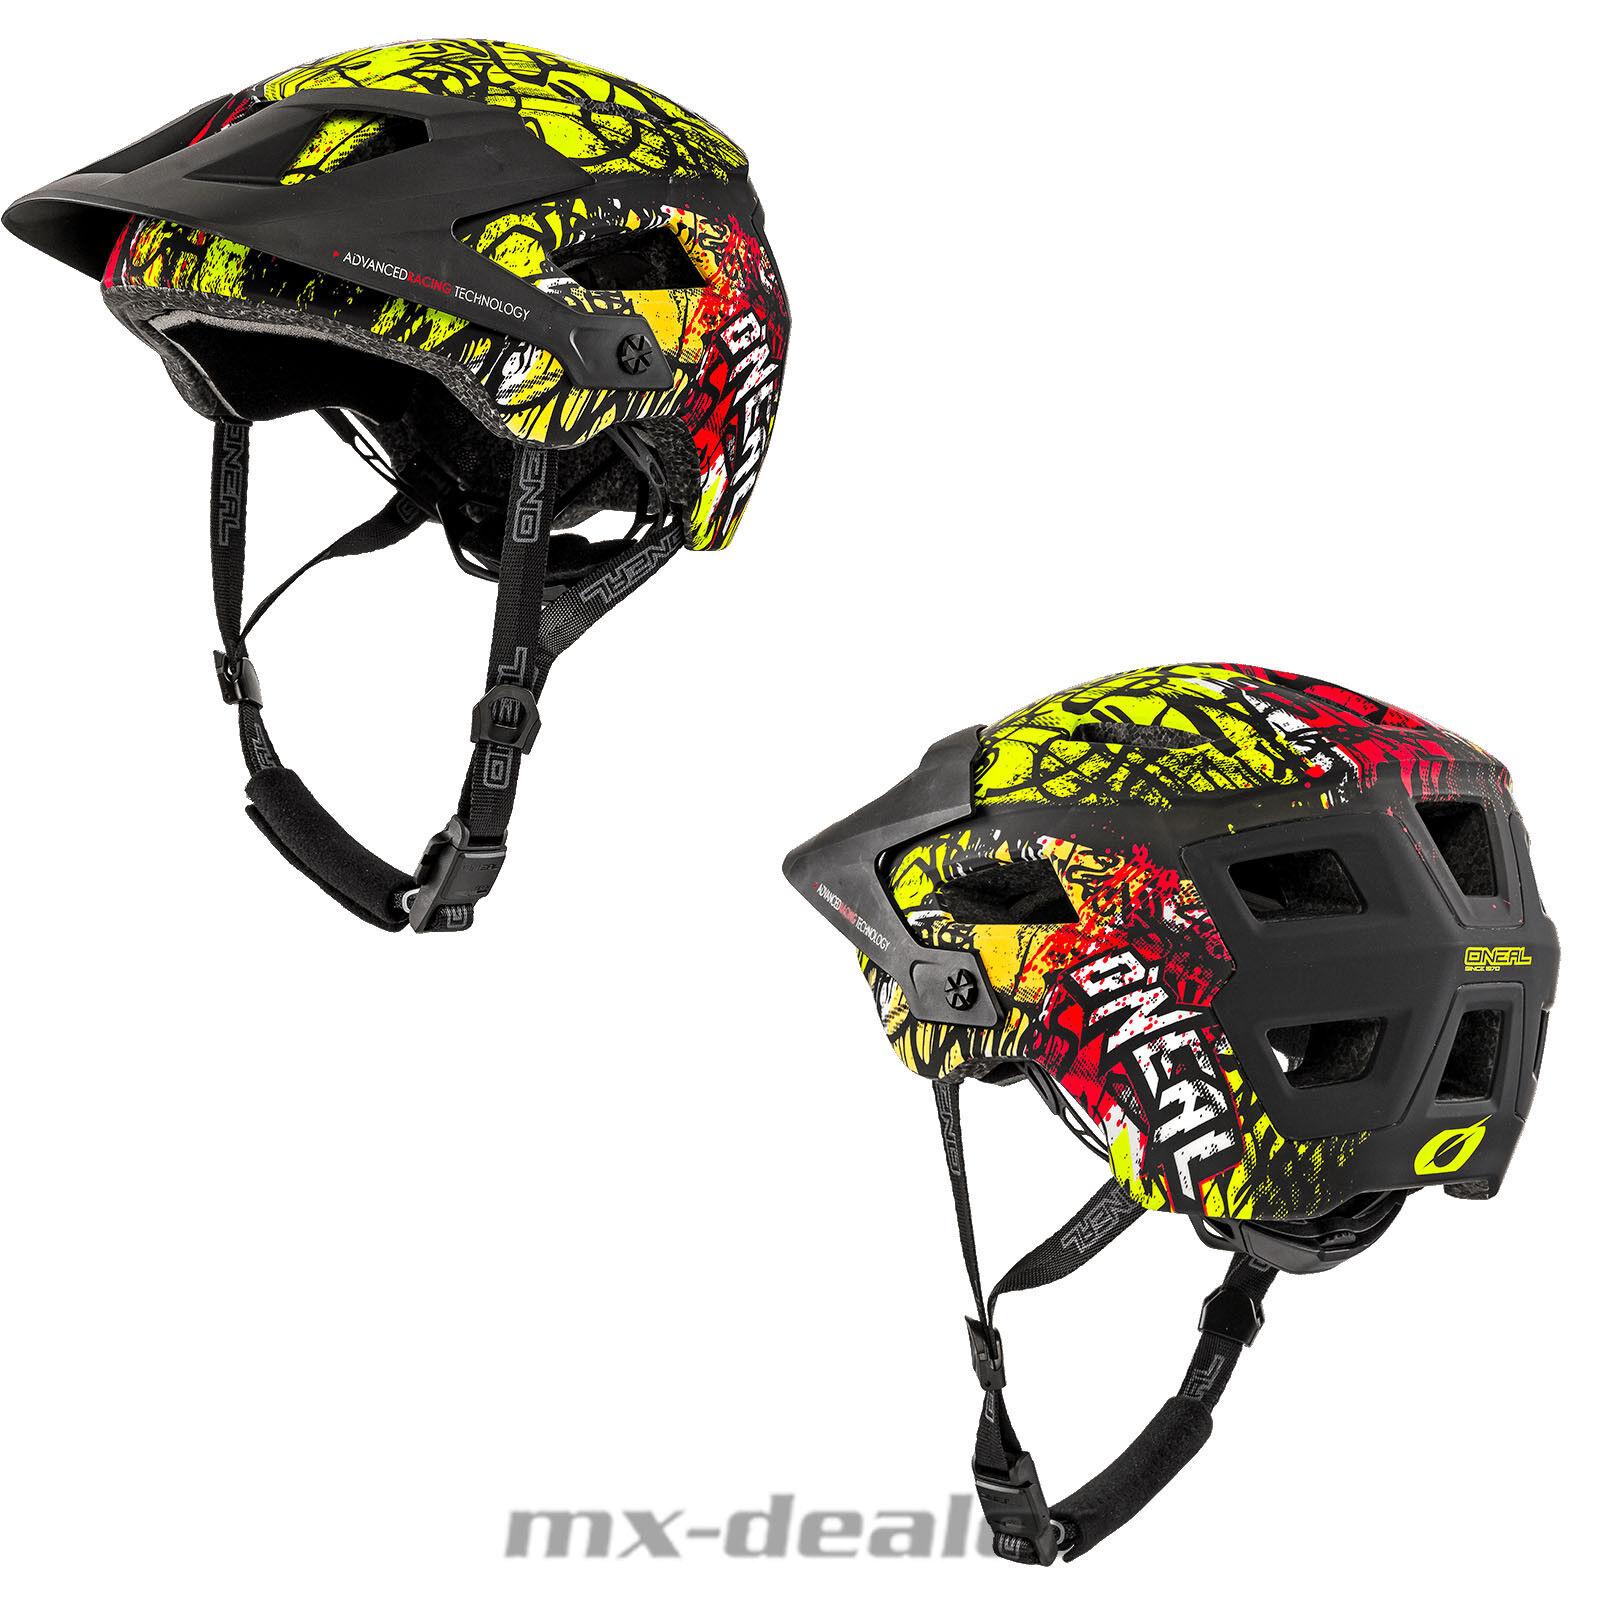 O'NEAL Defender 2.0 Casco Casco 2.0 para bicicleta All Mountain Trail Mtb Enduro VANDAL 16775f